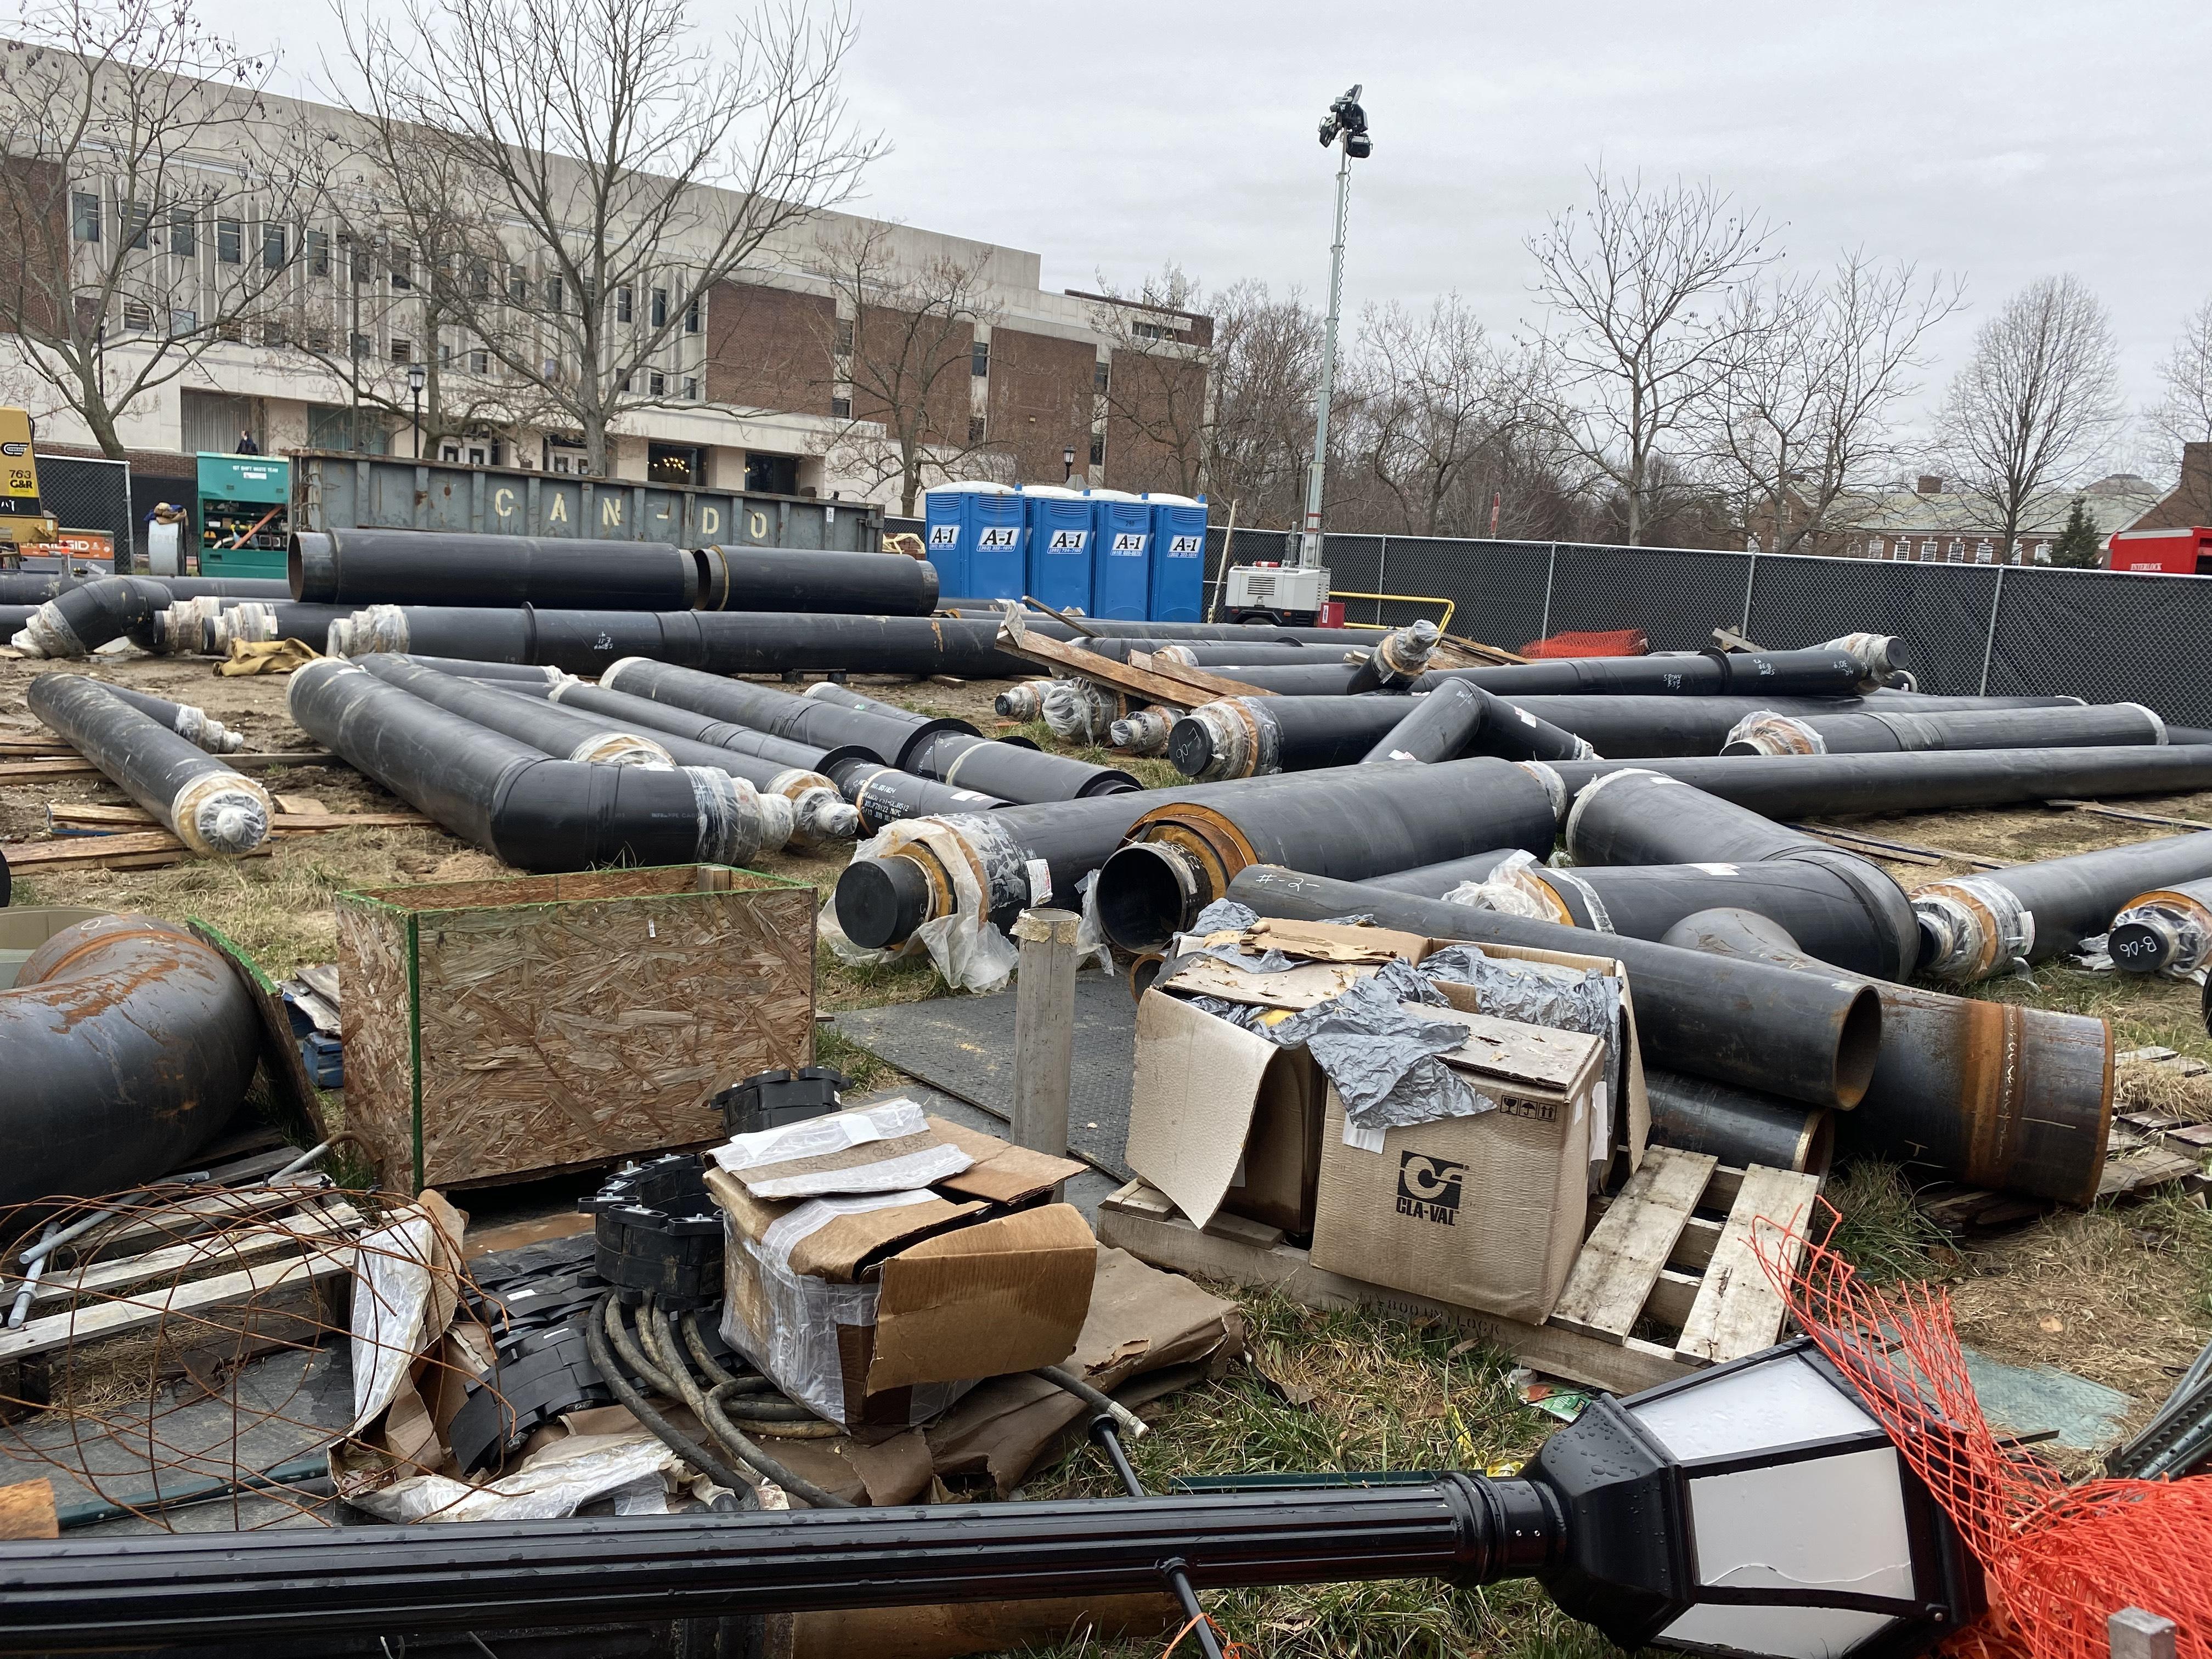 (Satire) Winter Break: what is happening on campus?